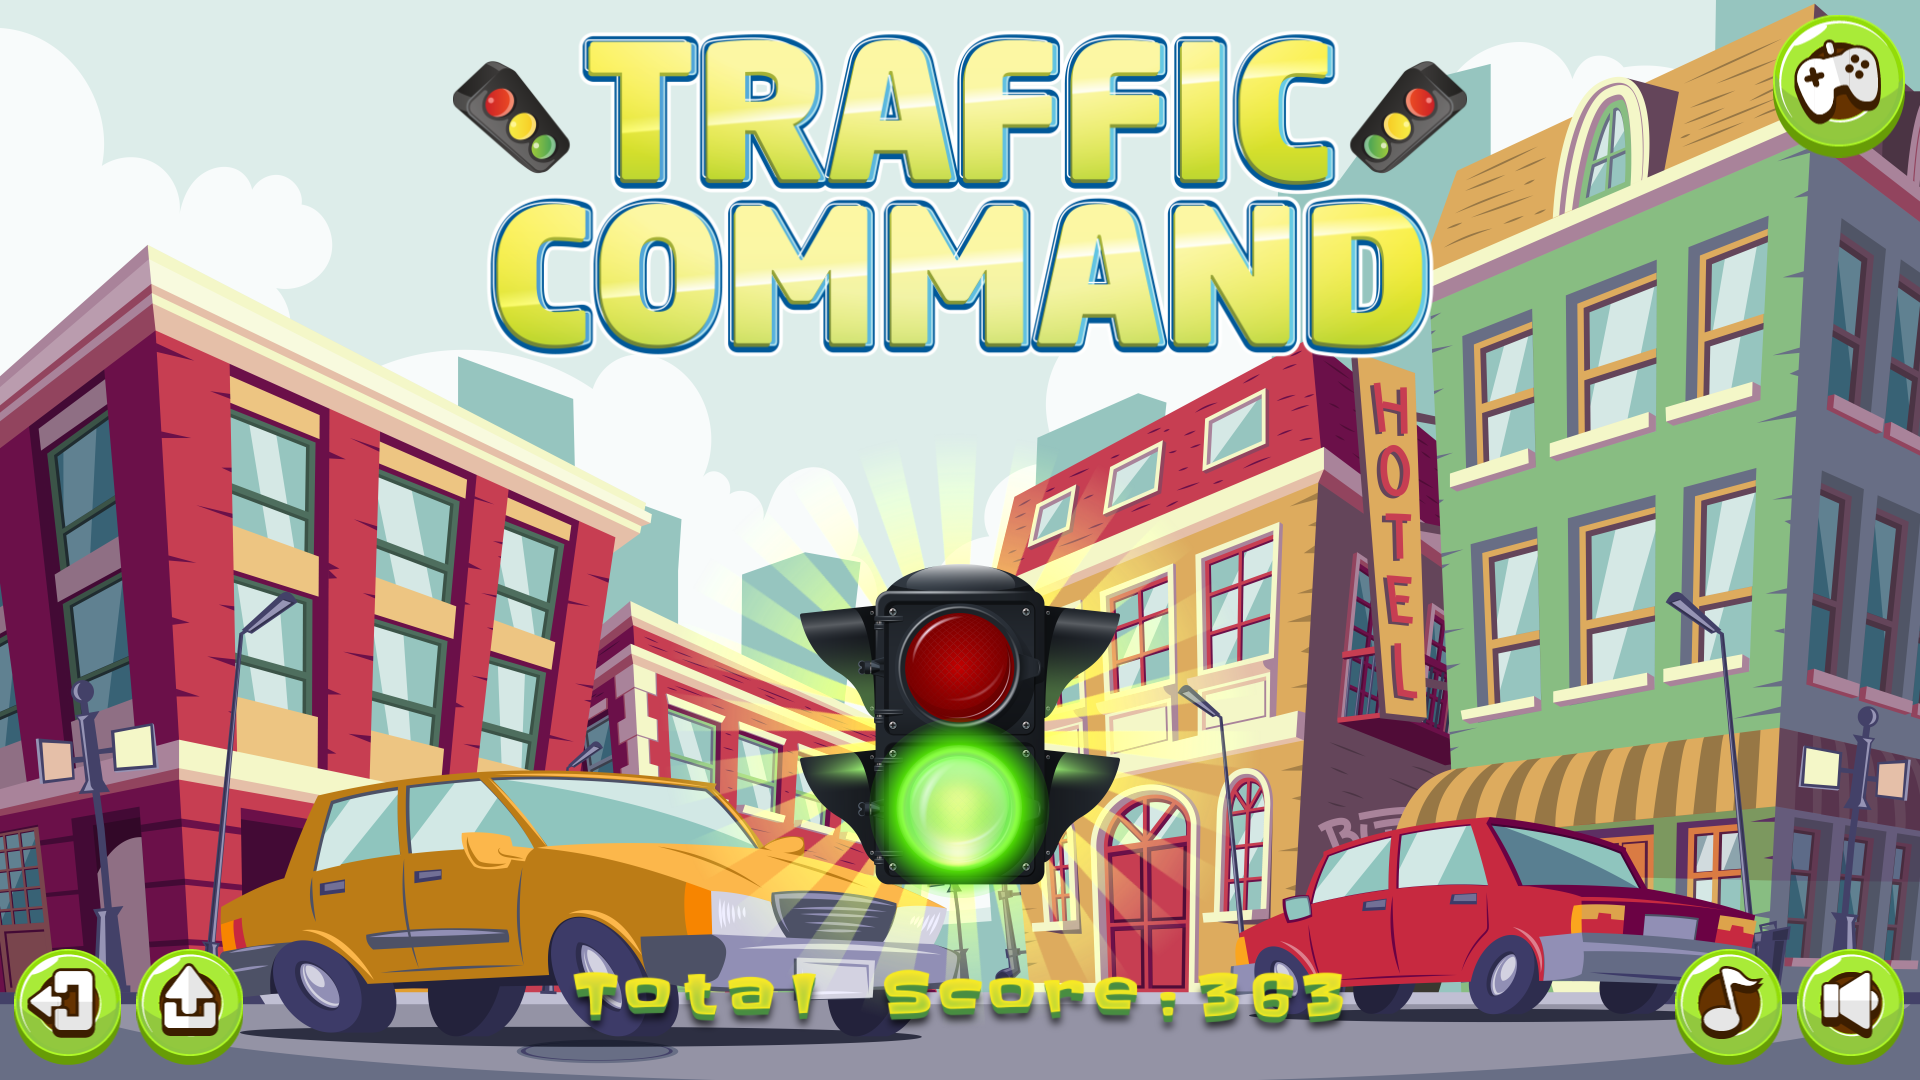 Traffic command game 2 twin pine casino webcam